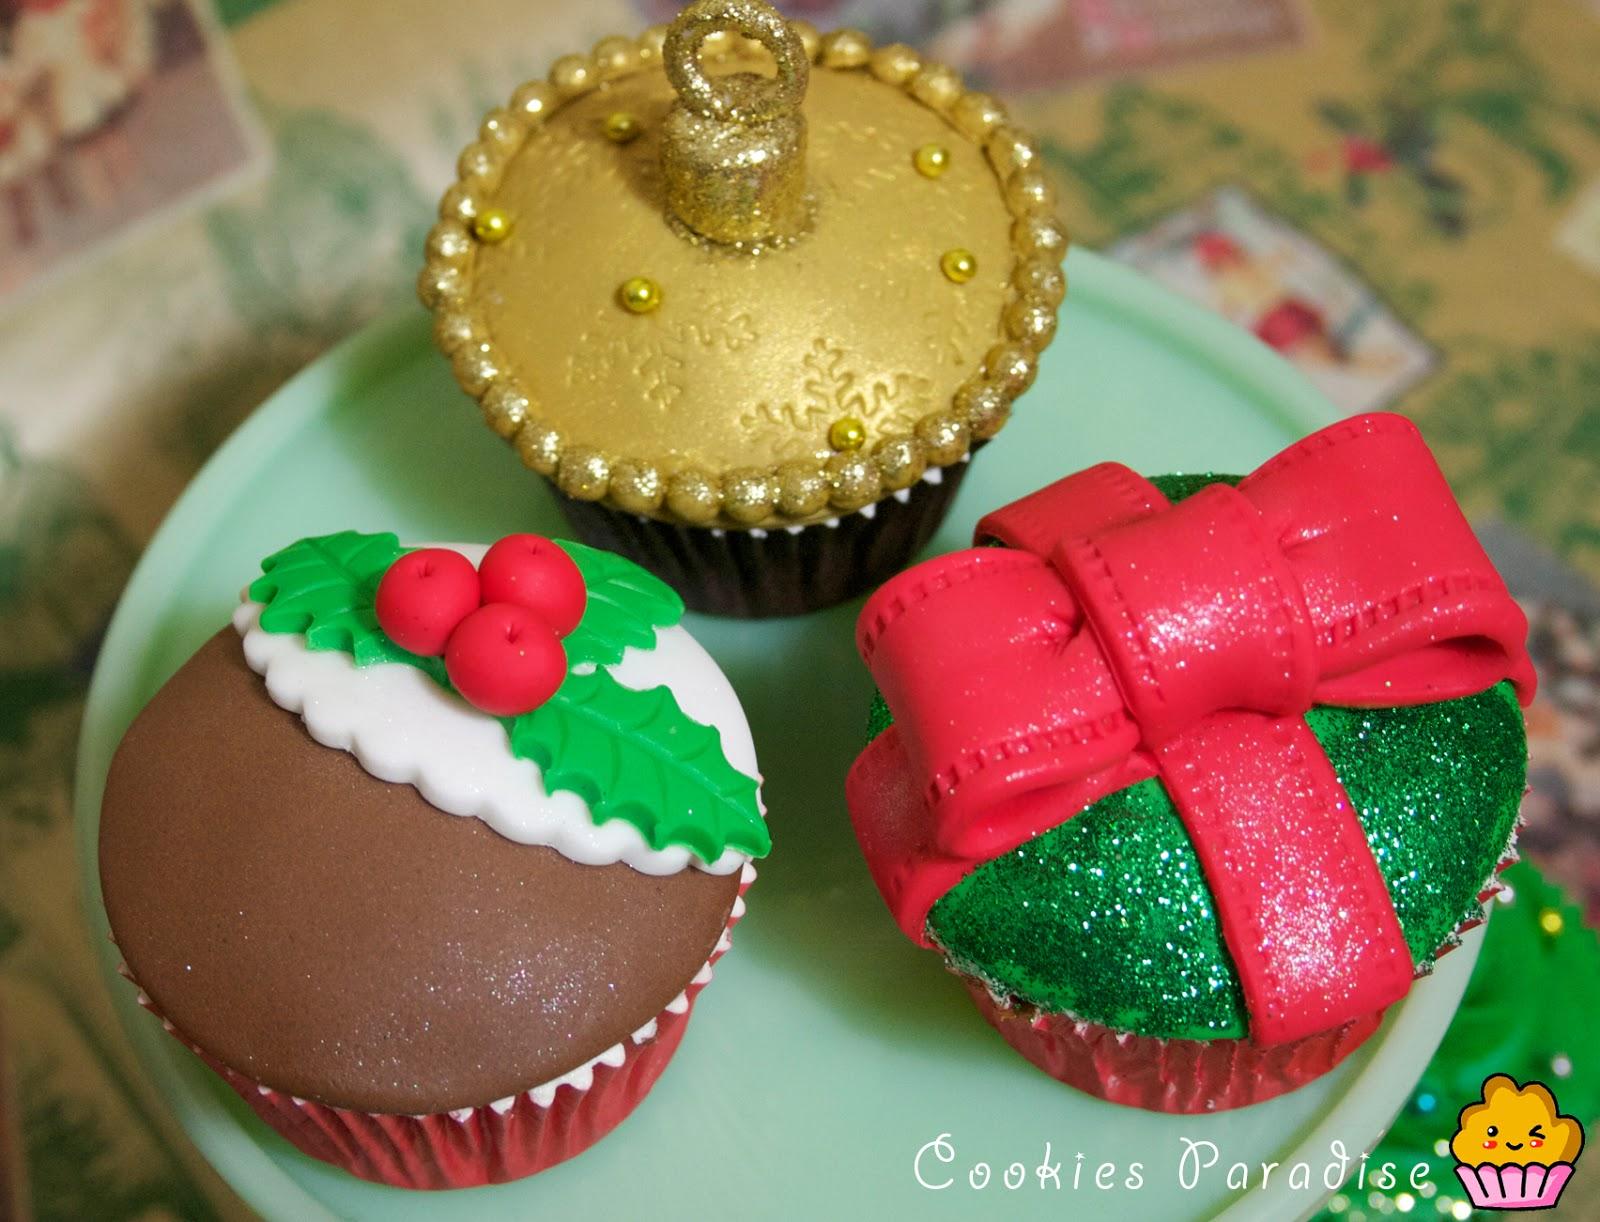 Mis cupcakes de navidad 2!! – CookiesParadise\'s Blog